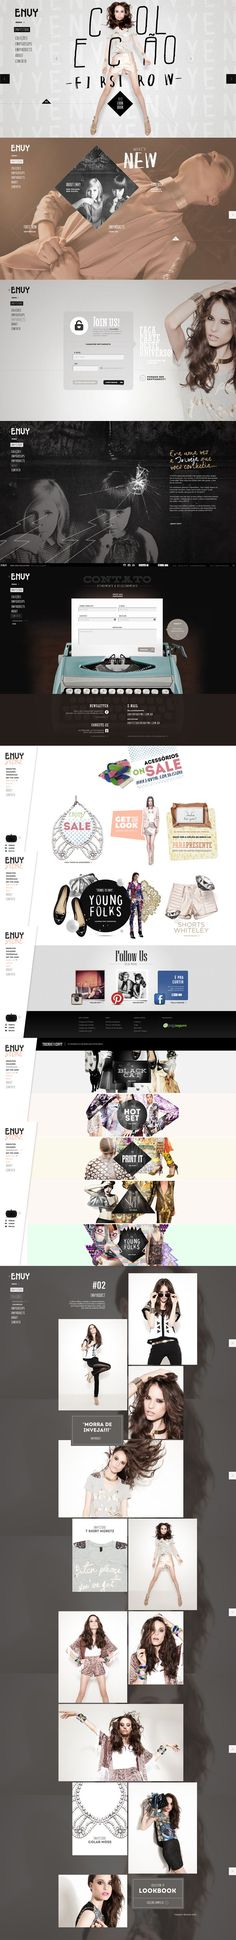 Envy First Row Collection | Designer: Pianofuzz Design Studio